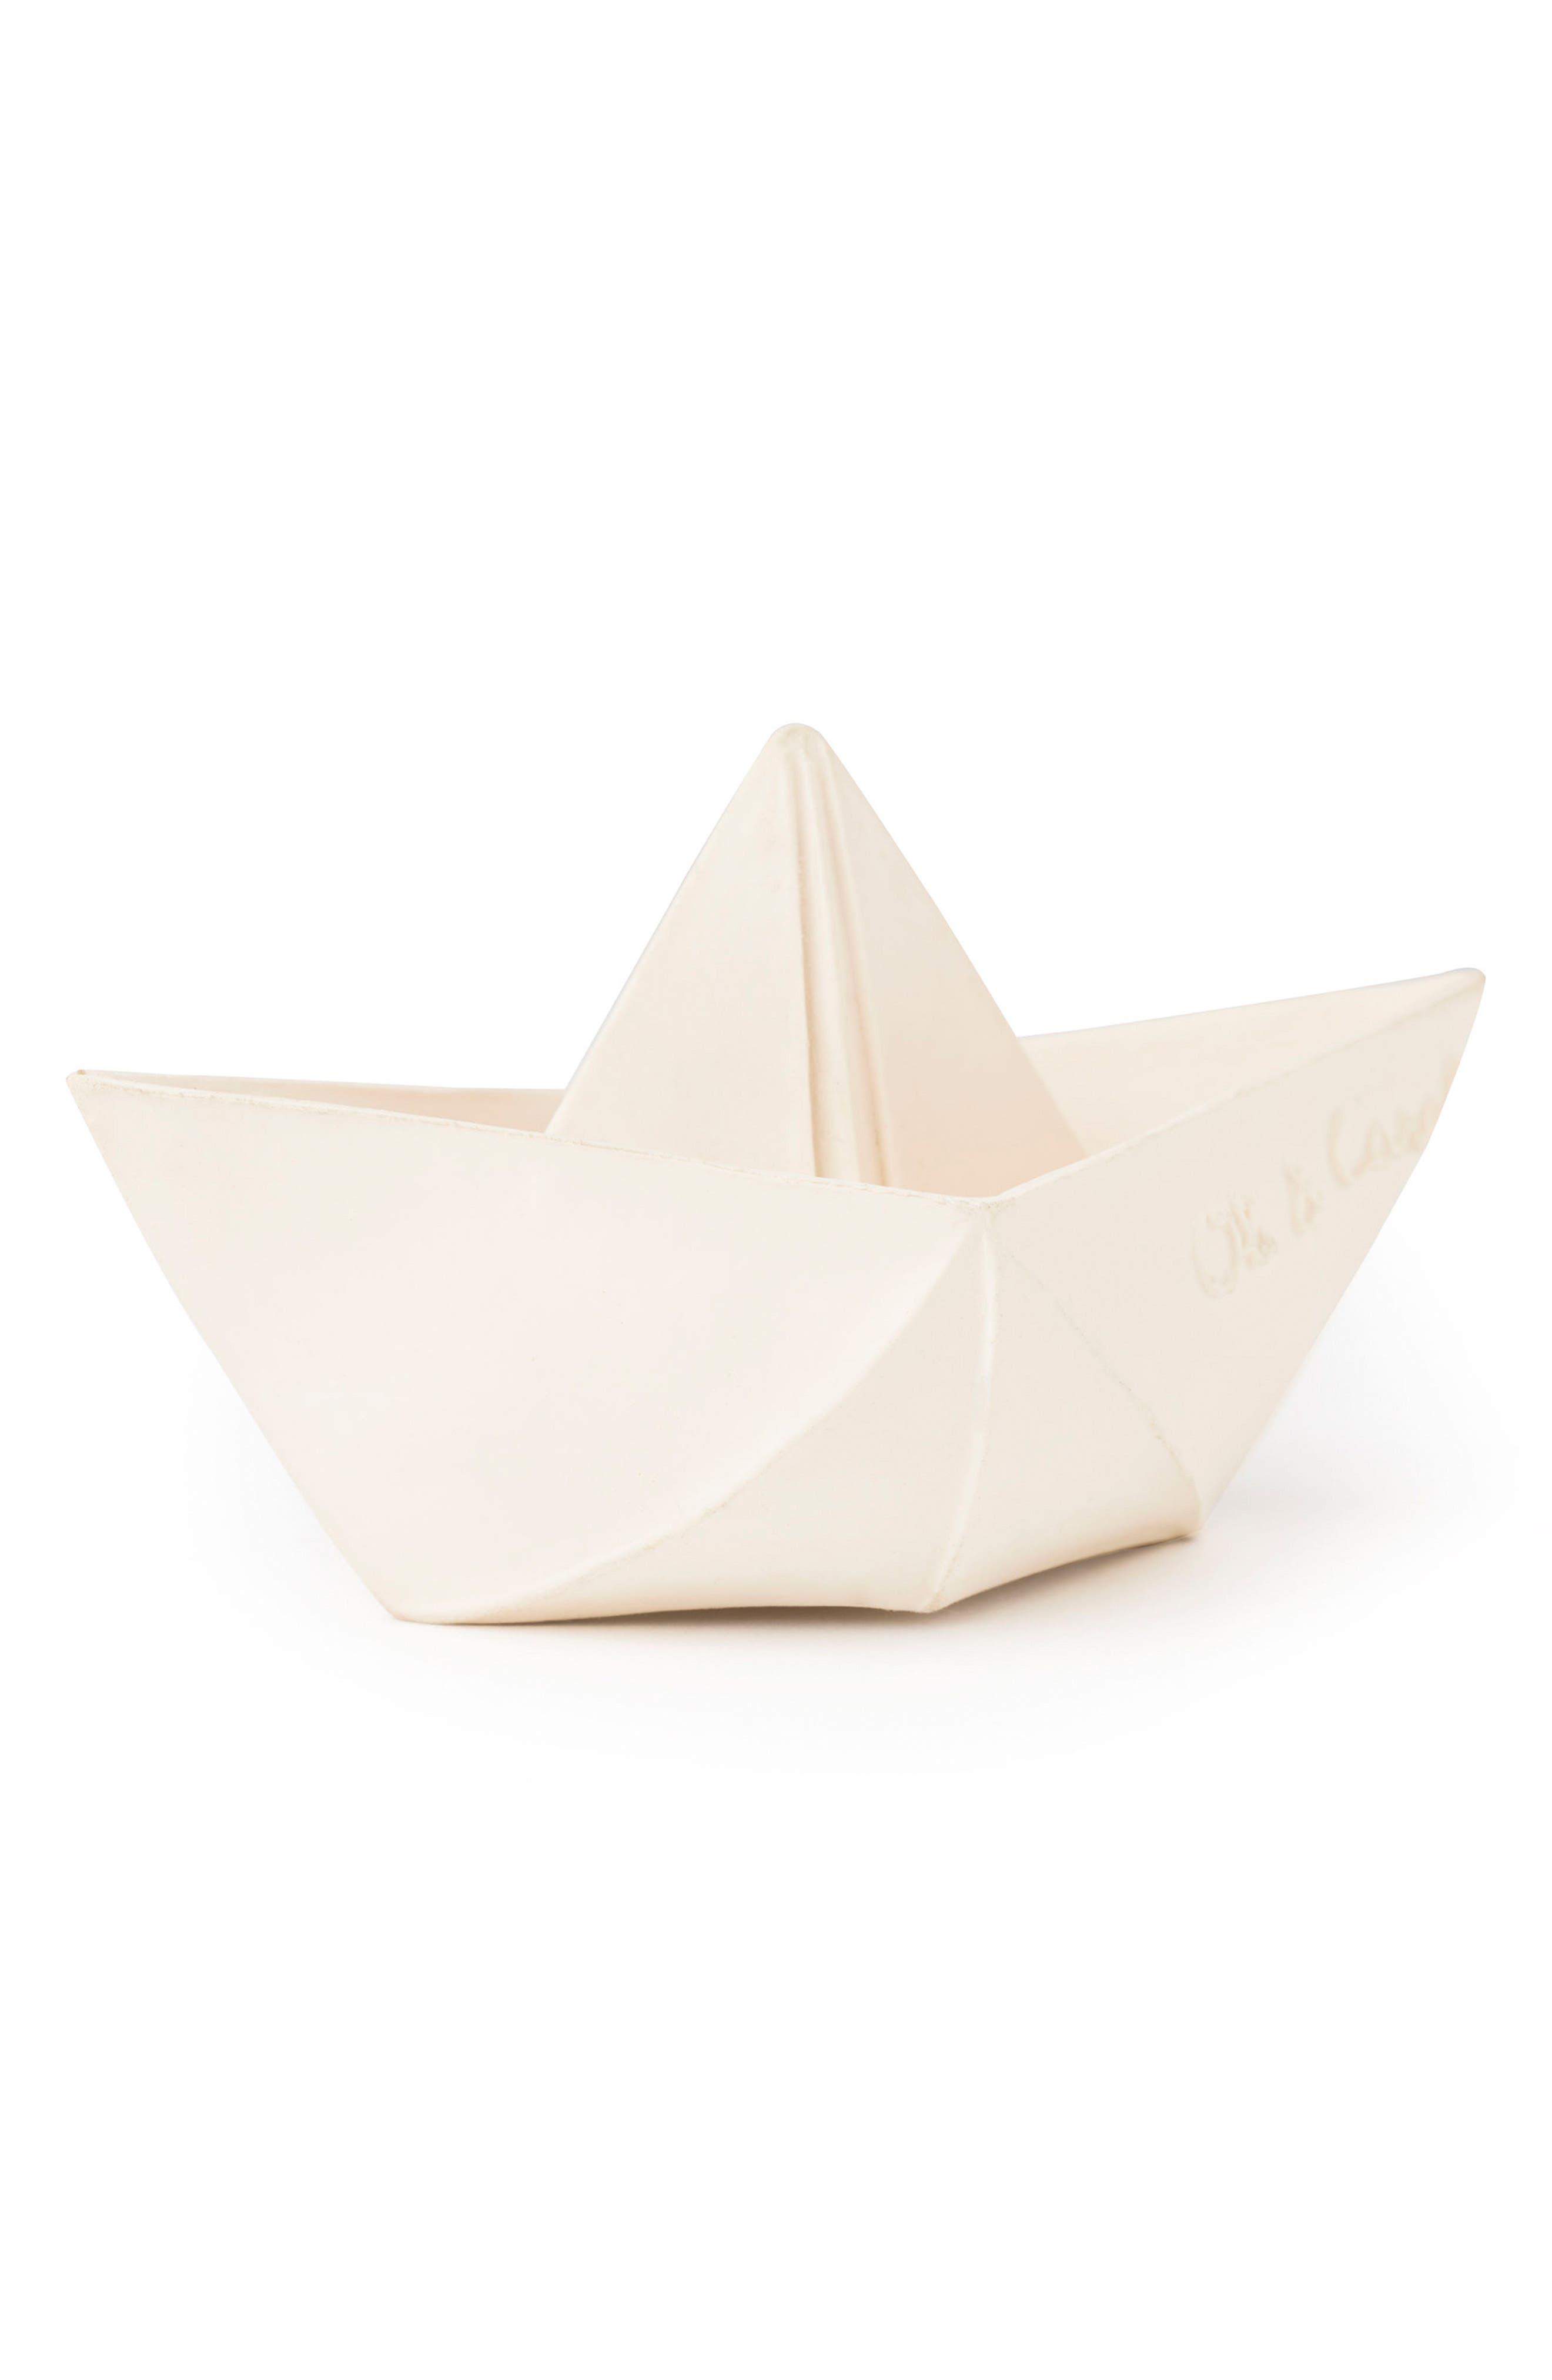 Origami Boat Bath Toy,                         Main,                         color, WHITE